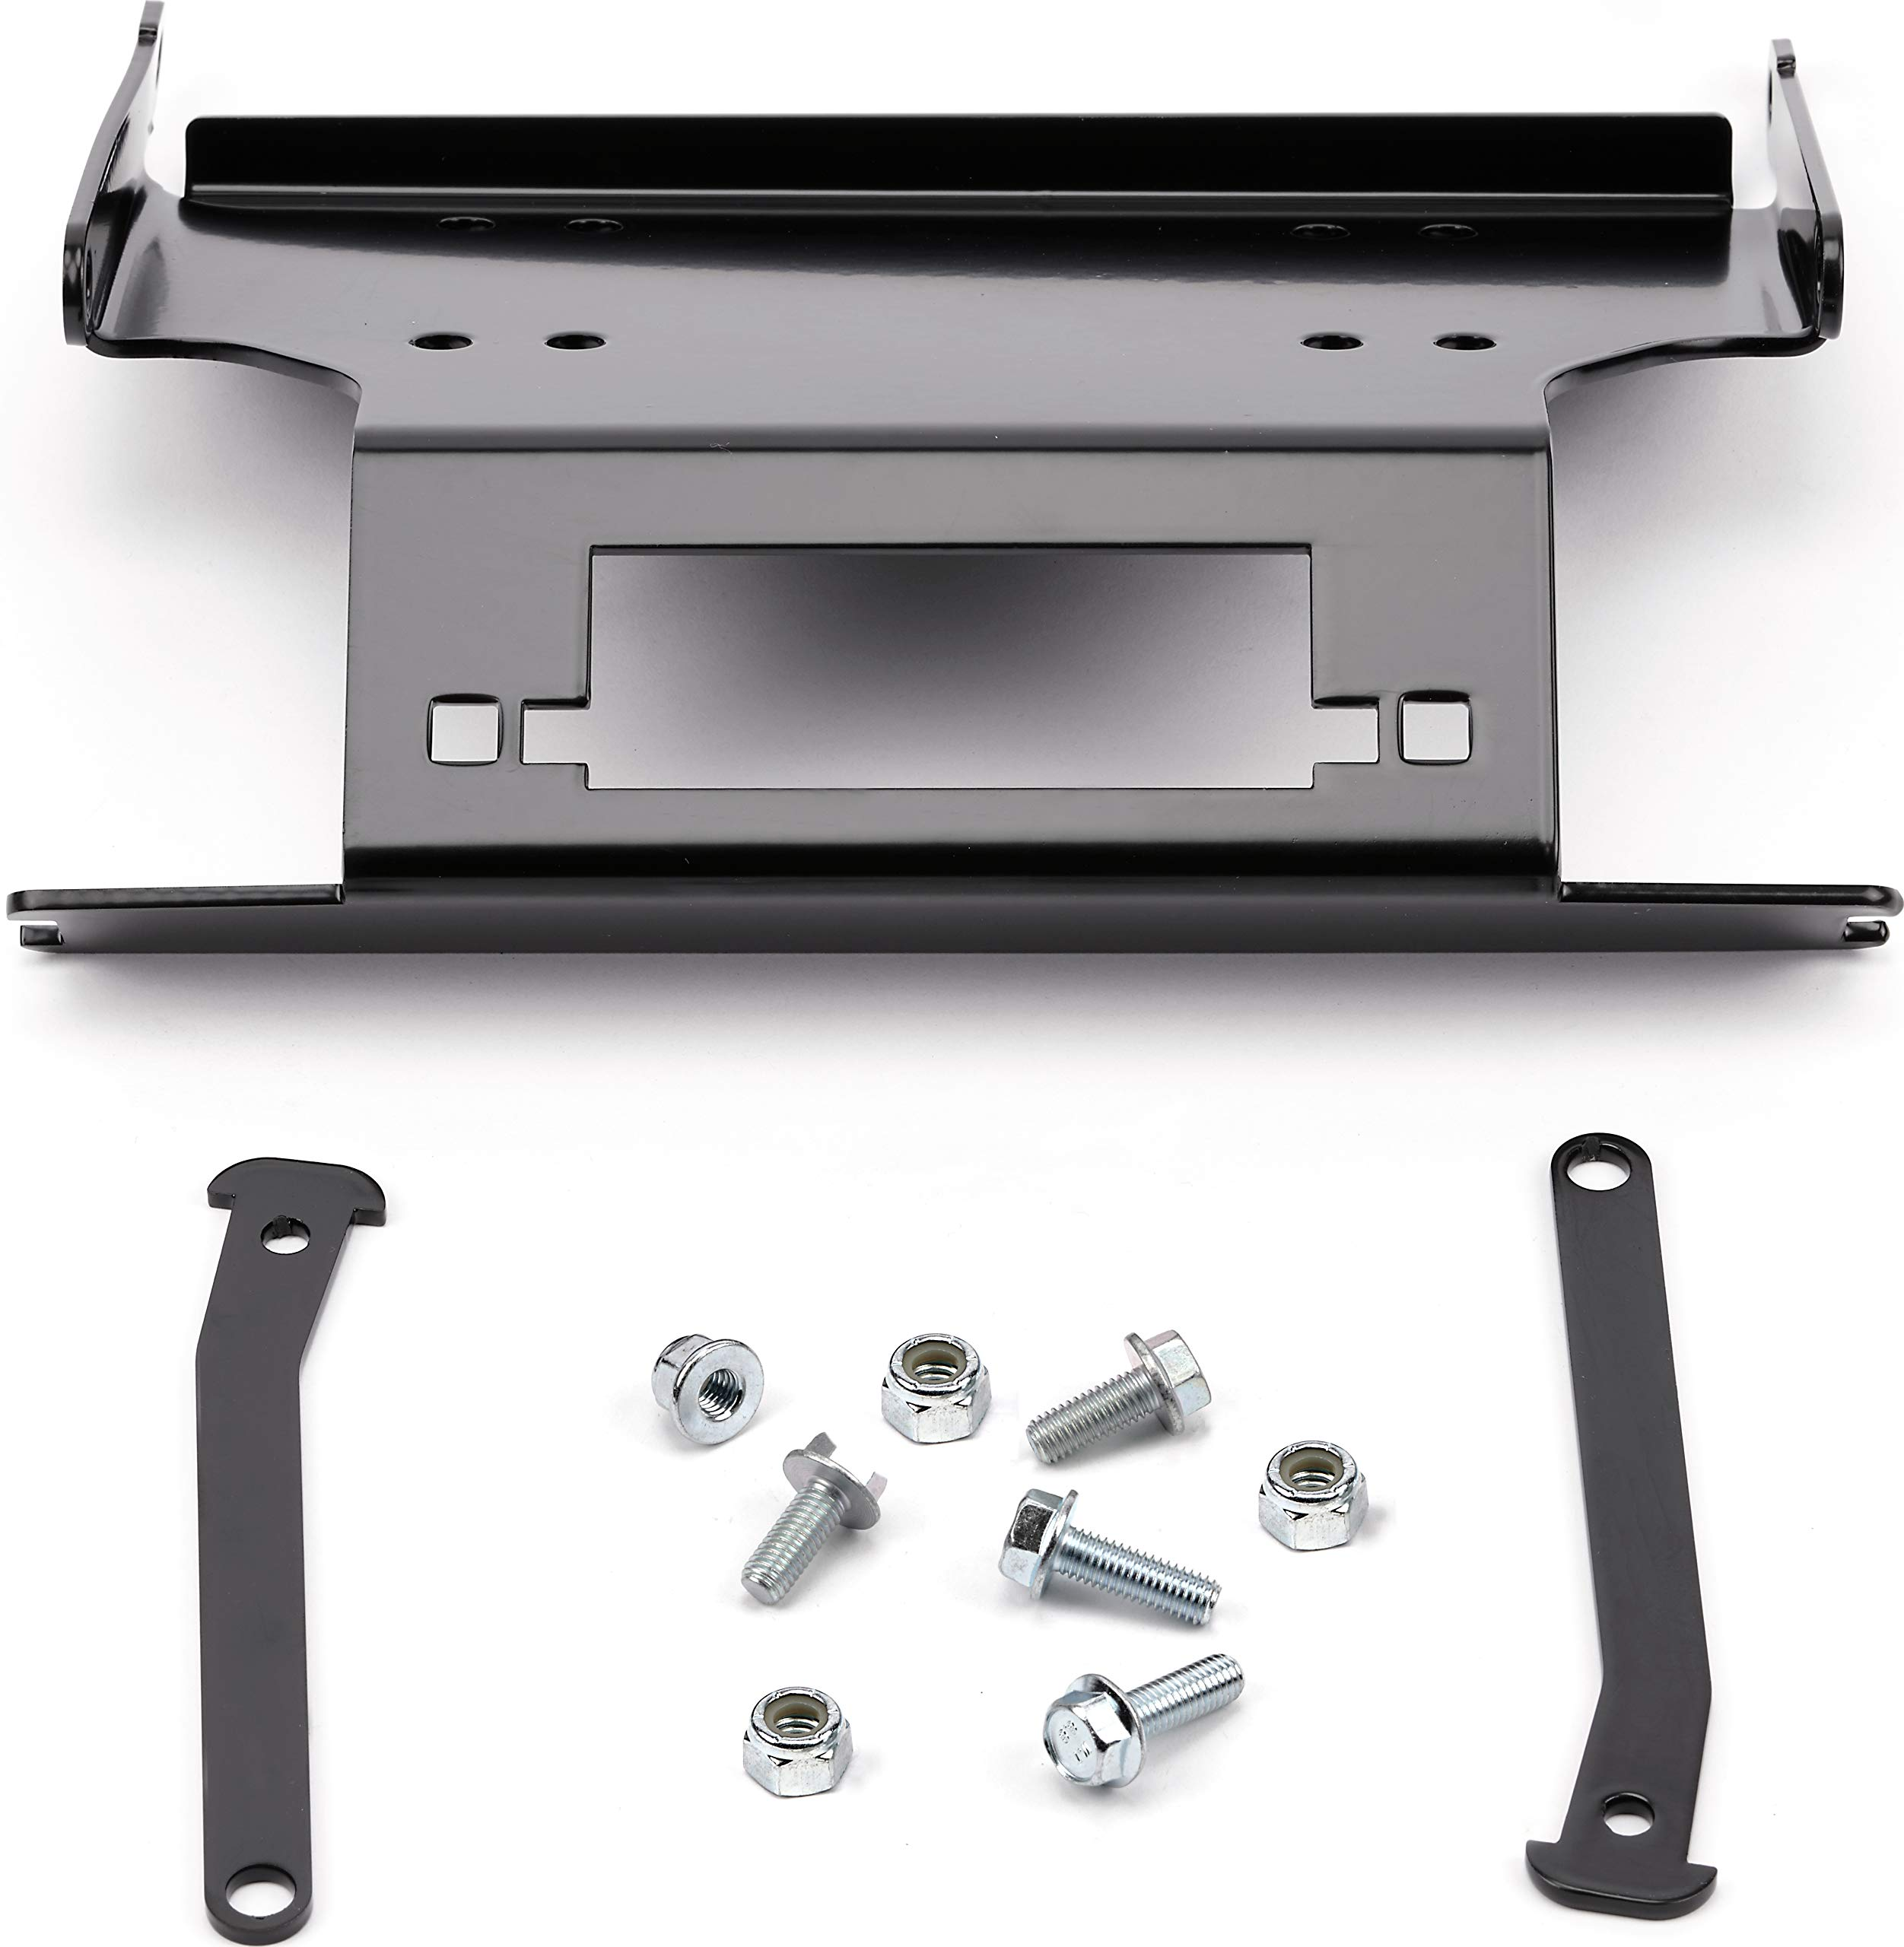 WARN 102600 Winch Mounting Kit, Fits: Honda Talon 1000 by WARN